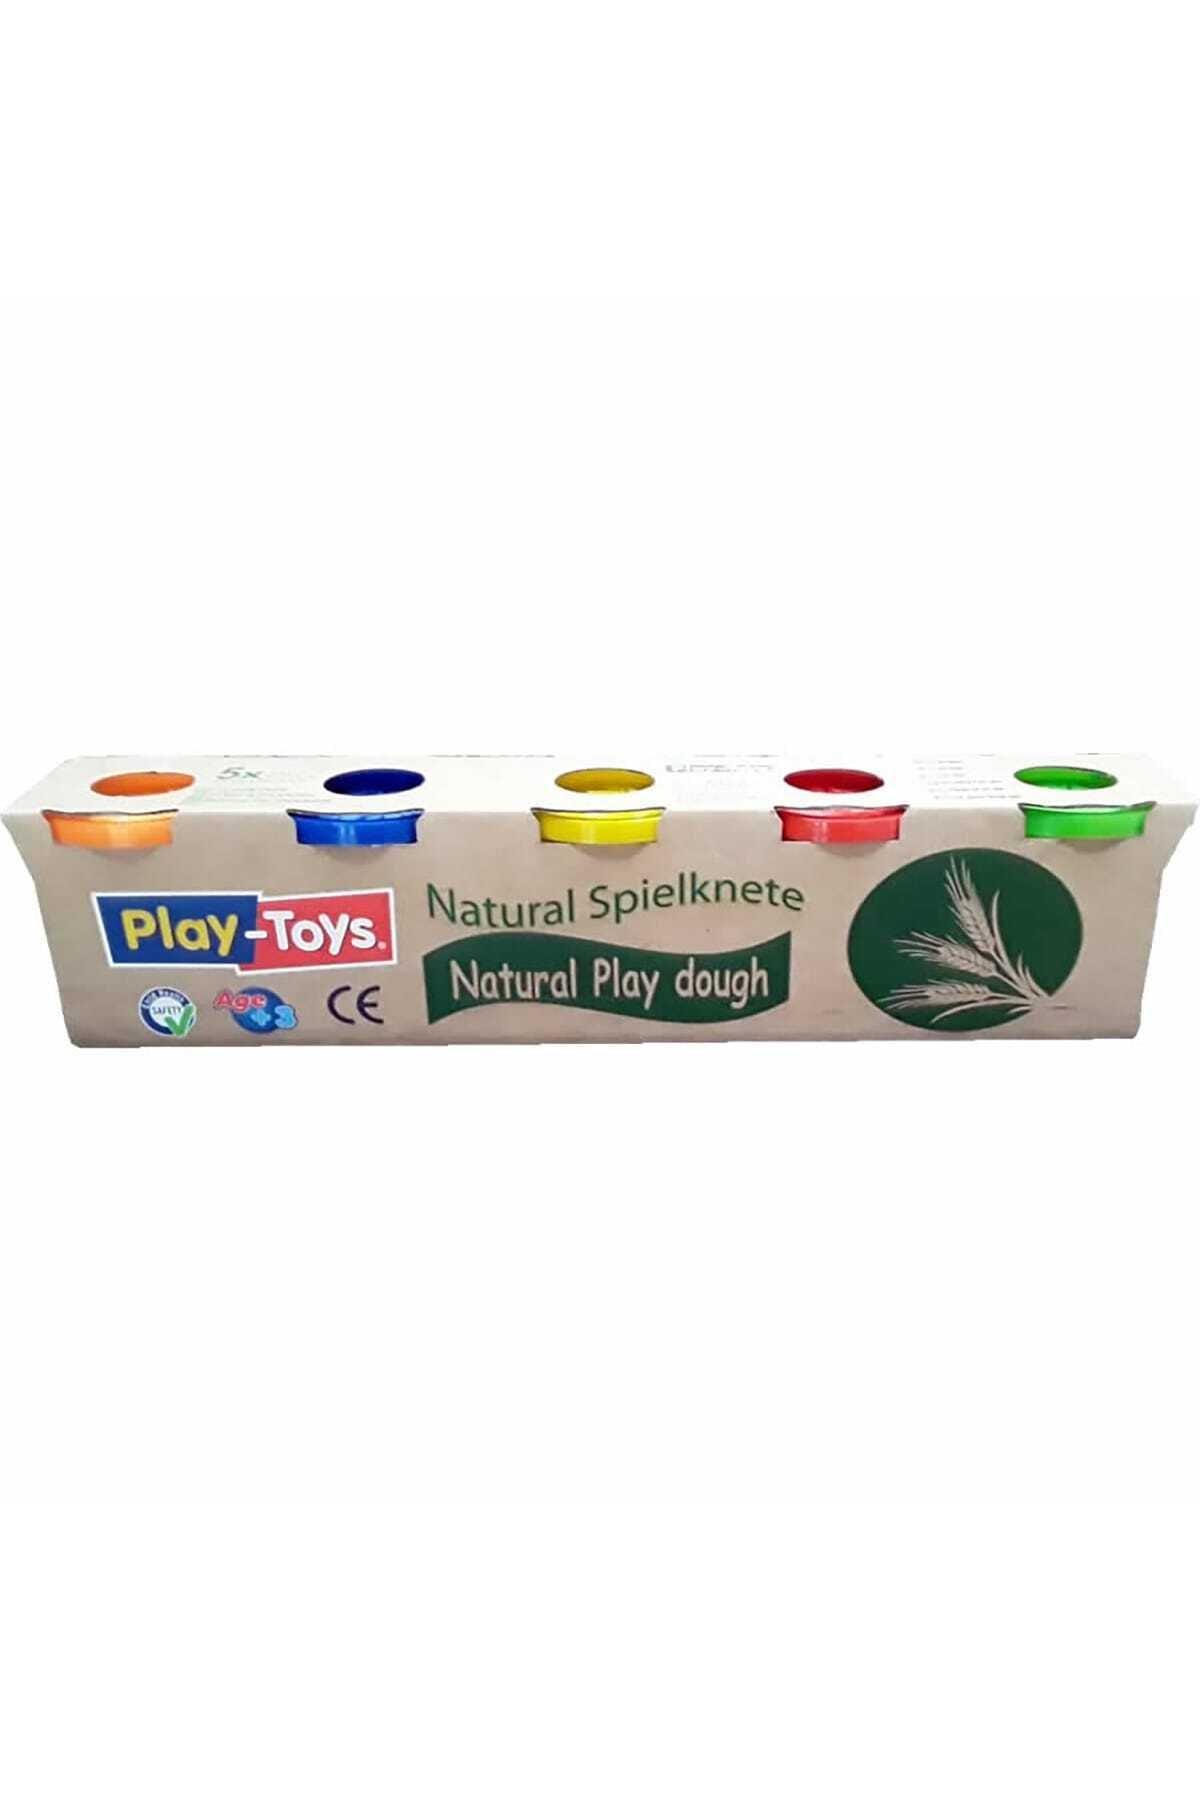 Play Toys Natural Oyun Hamuru 5li 1